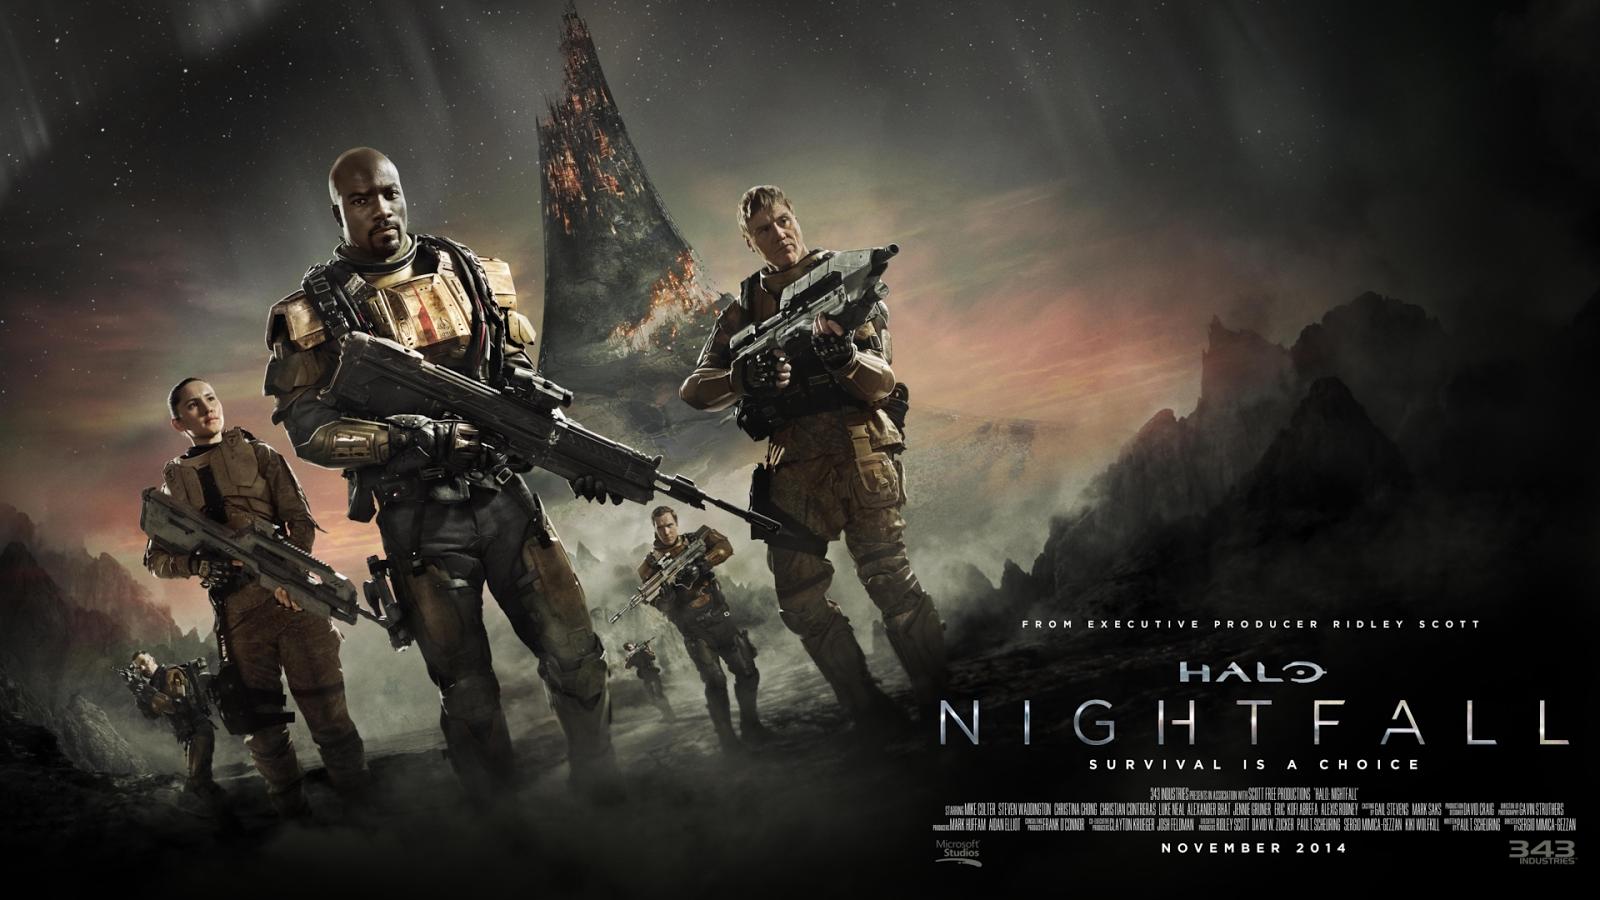 Future War Stories Fws News Feed The Halo Night Fall